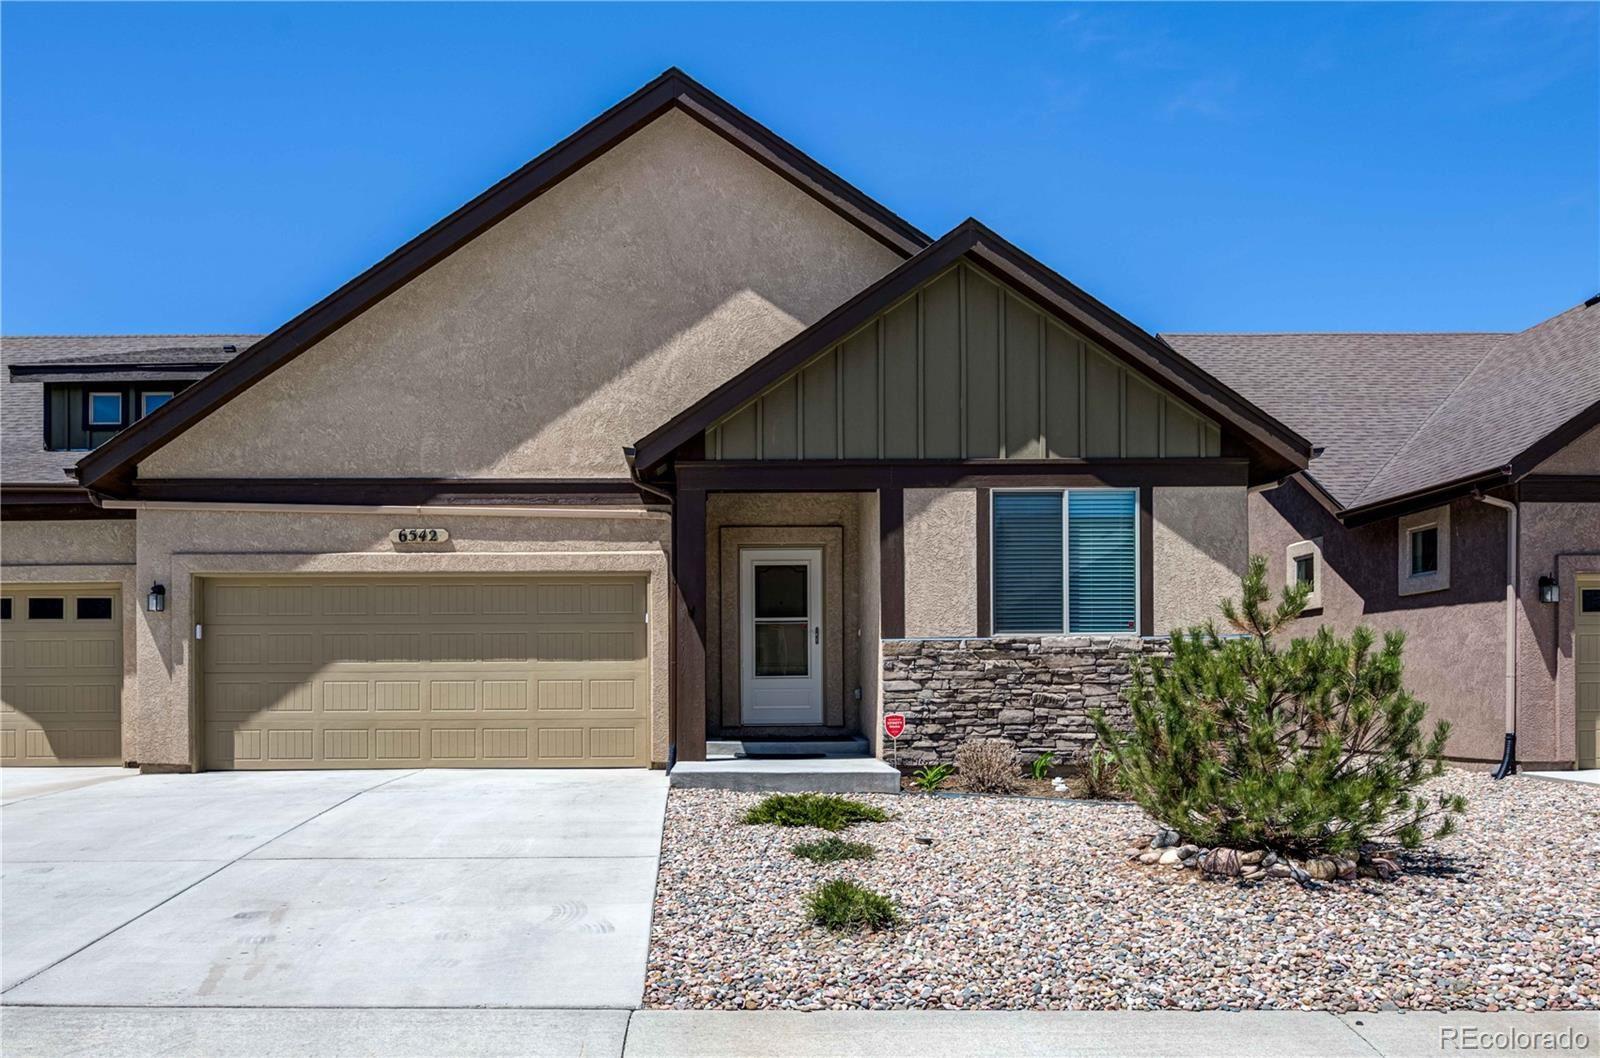 6542 Petaluma Point, Colorado Springs, CO 80923 - #: 8663574